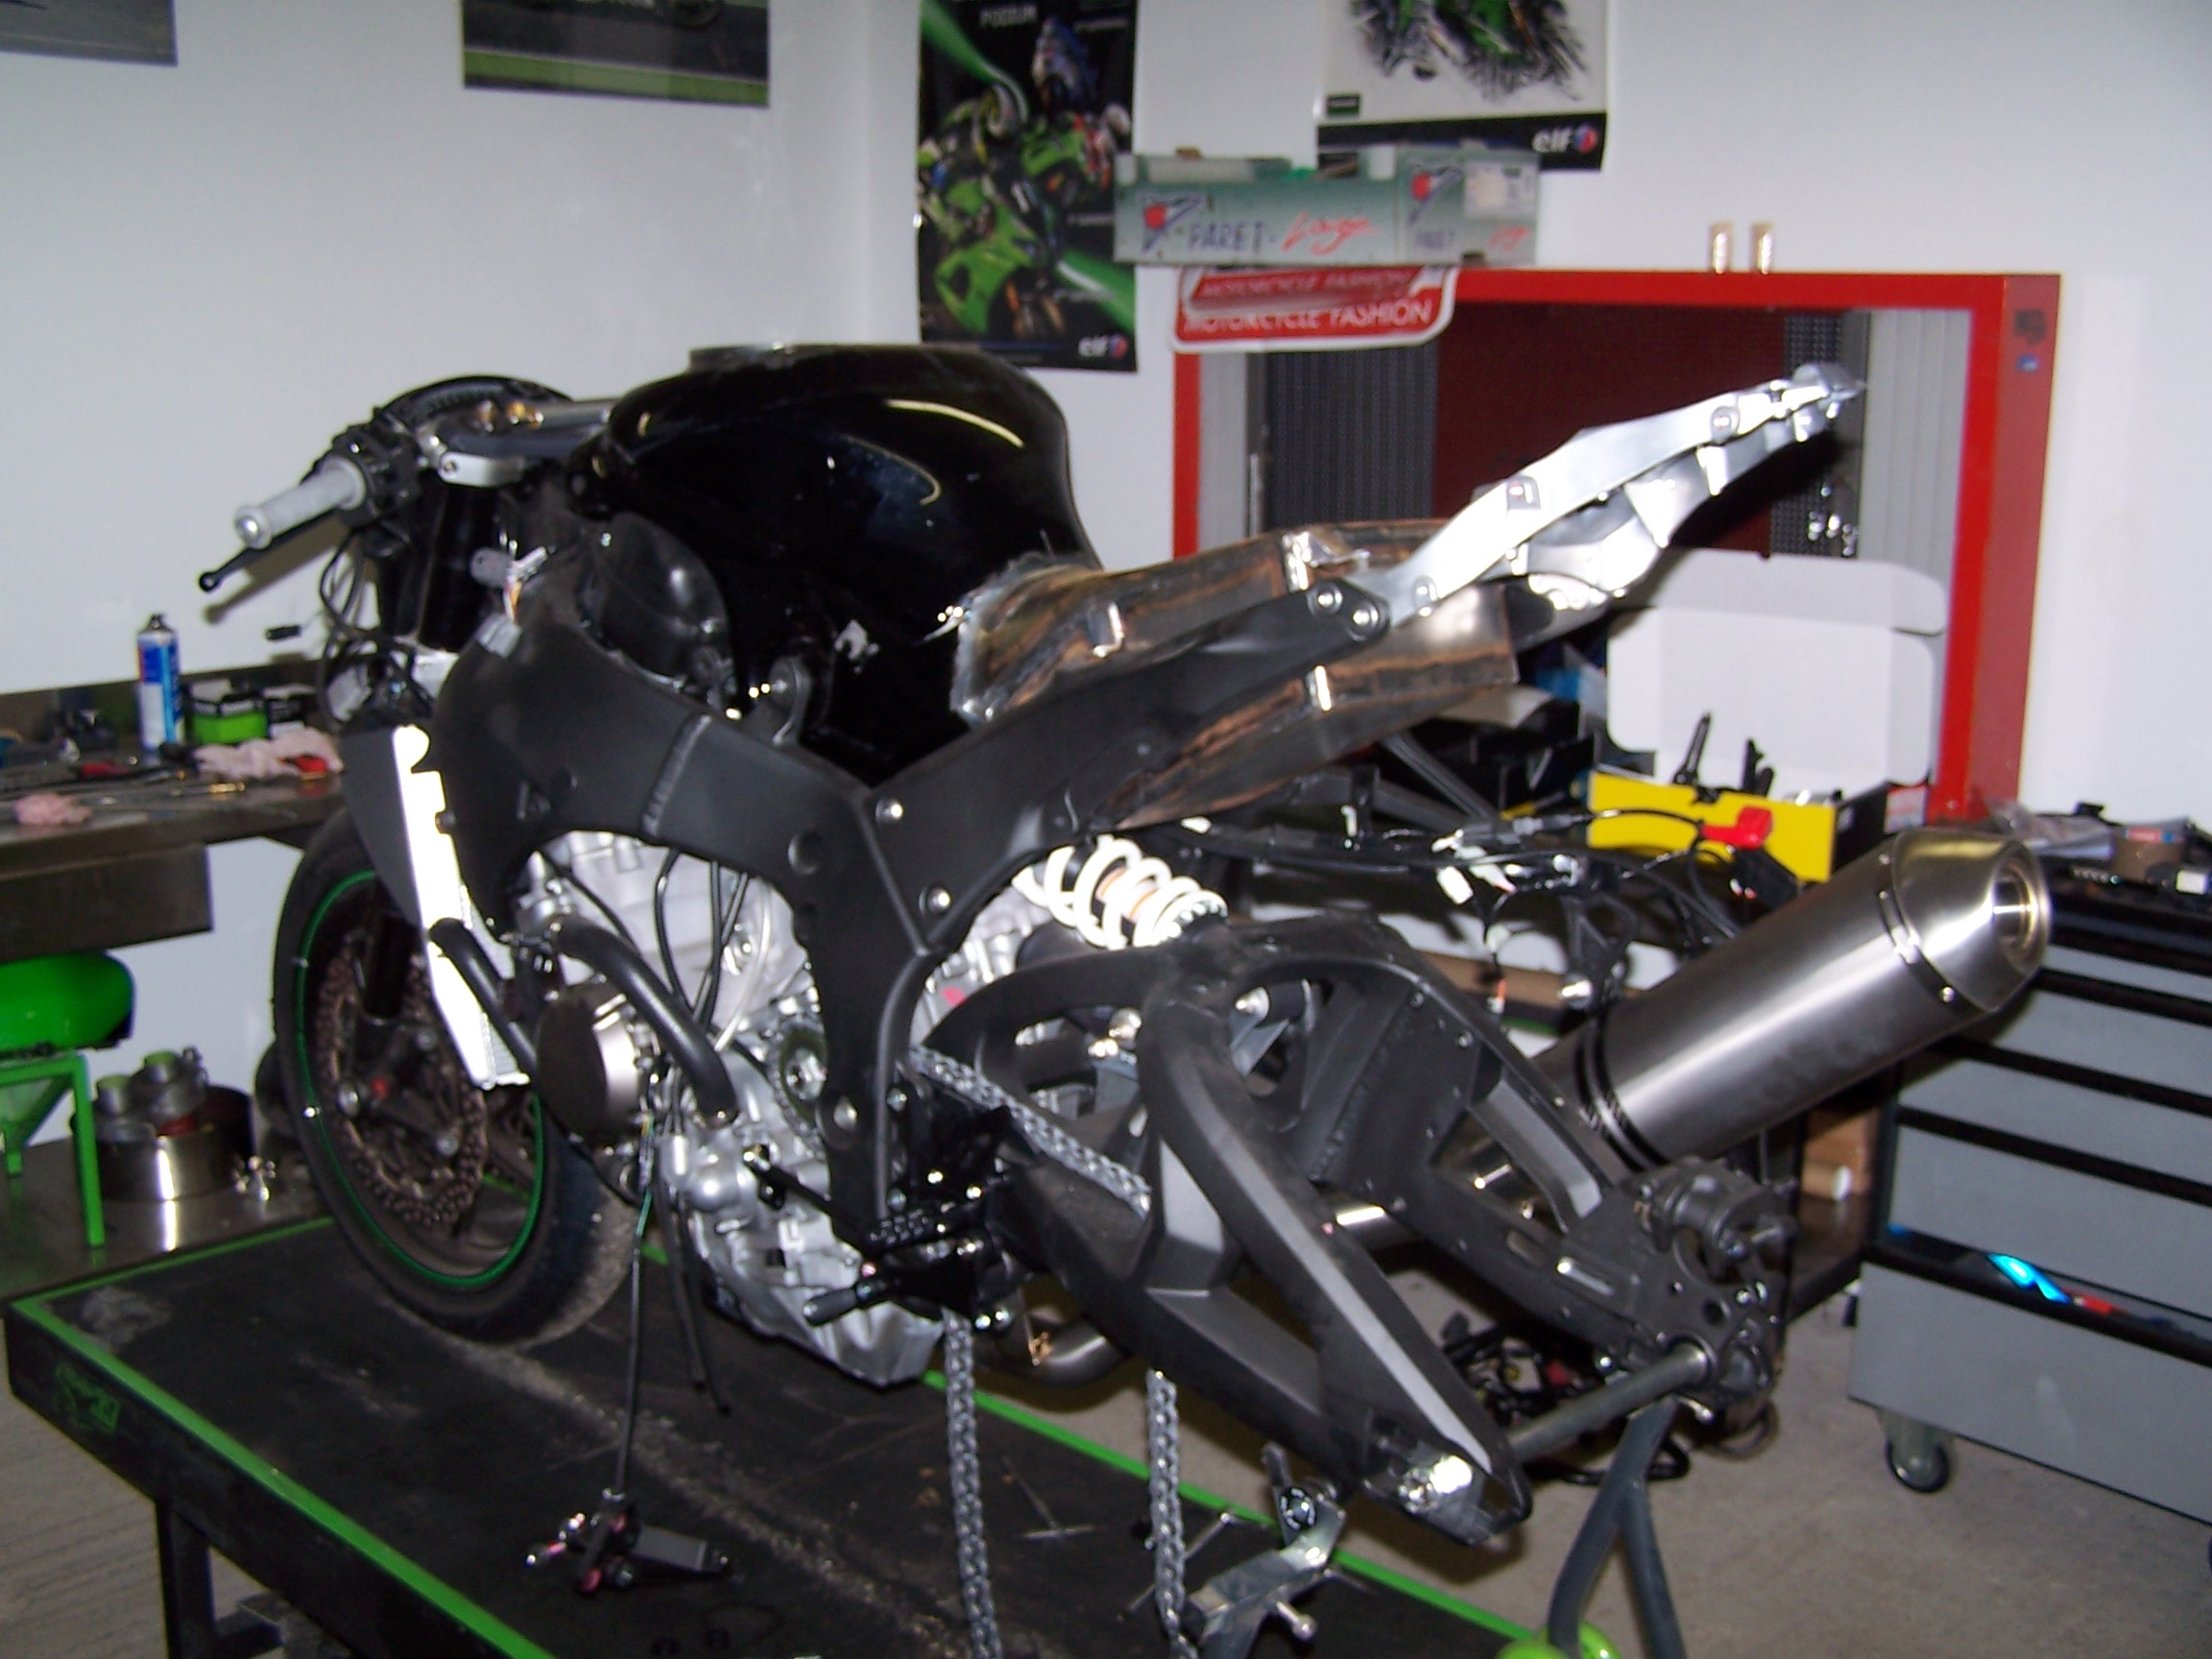 Zx10 r 2011(2)